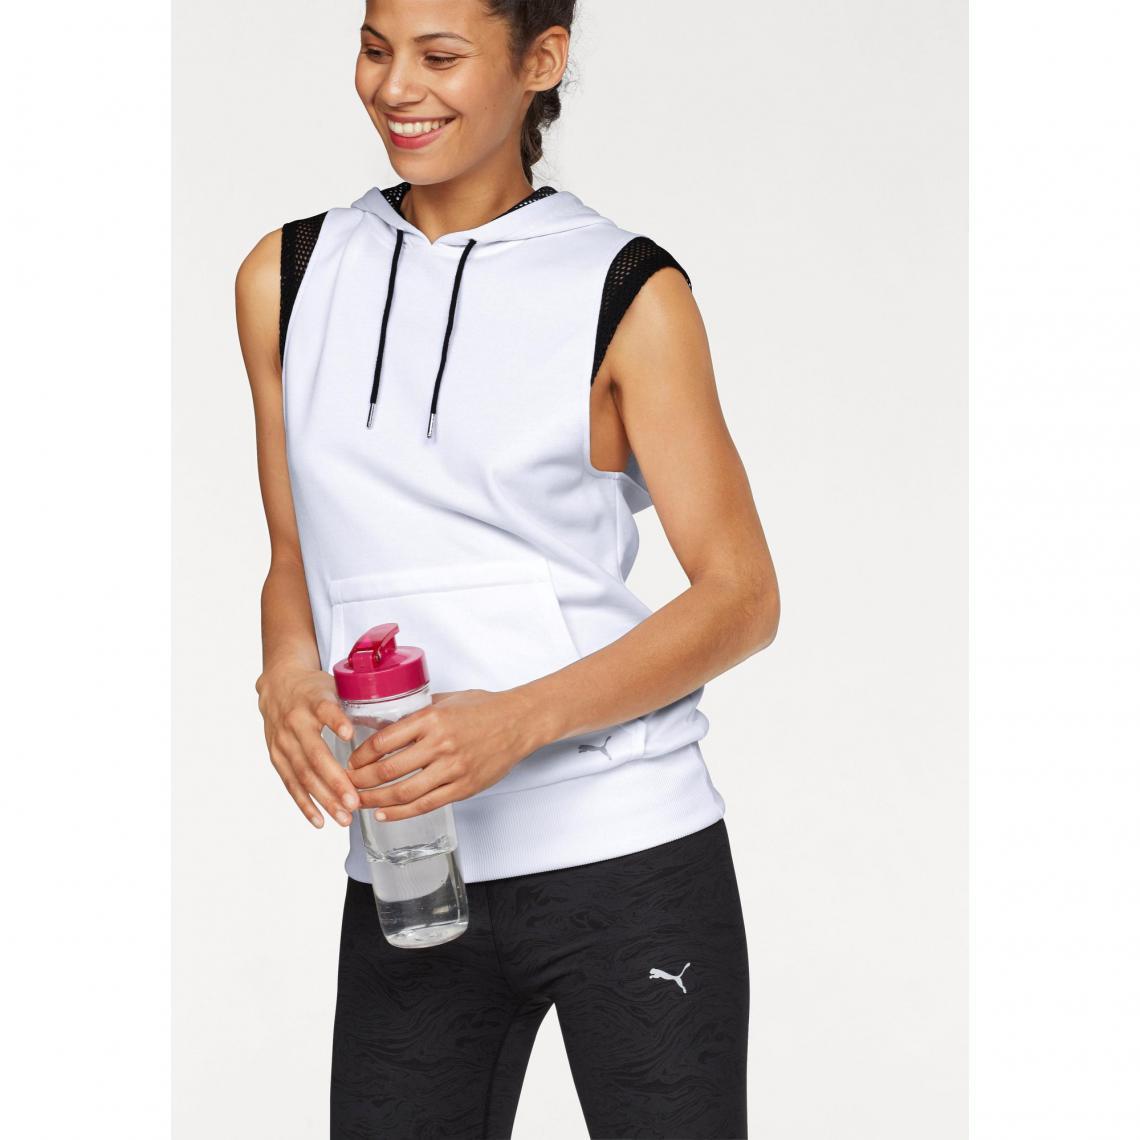 dfa09260126 Sweat-shirt à capuche sans manches femme Explosive Sleeveless Hoodie Puma  Puma Femme